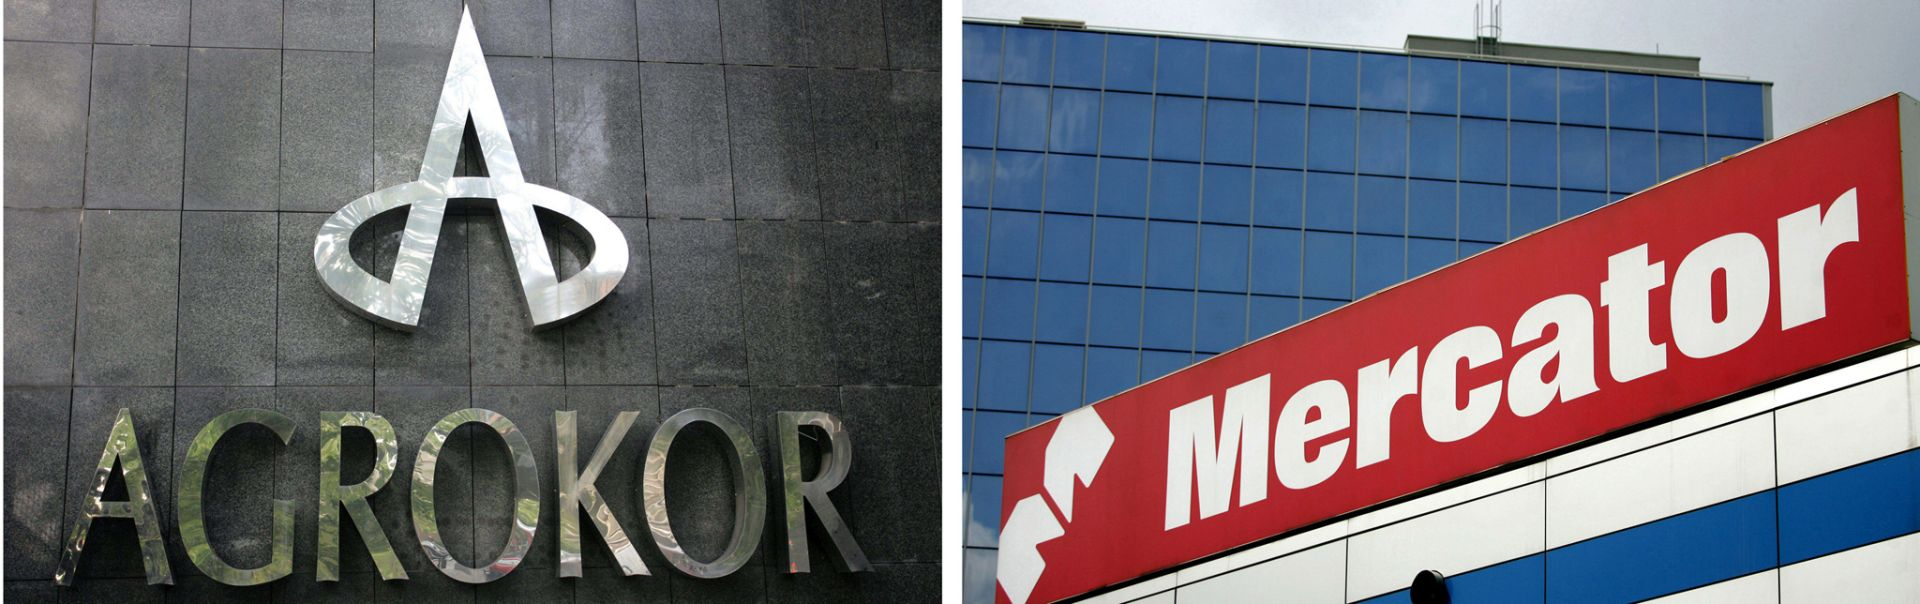 AGROKOR Slovenski mediji o Agrokoru i Mercatoru